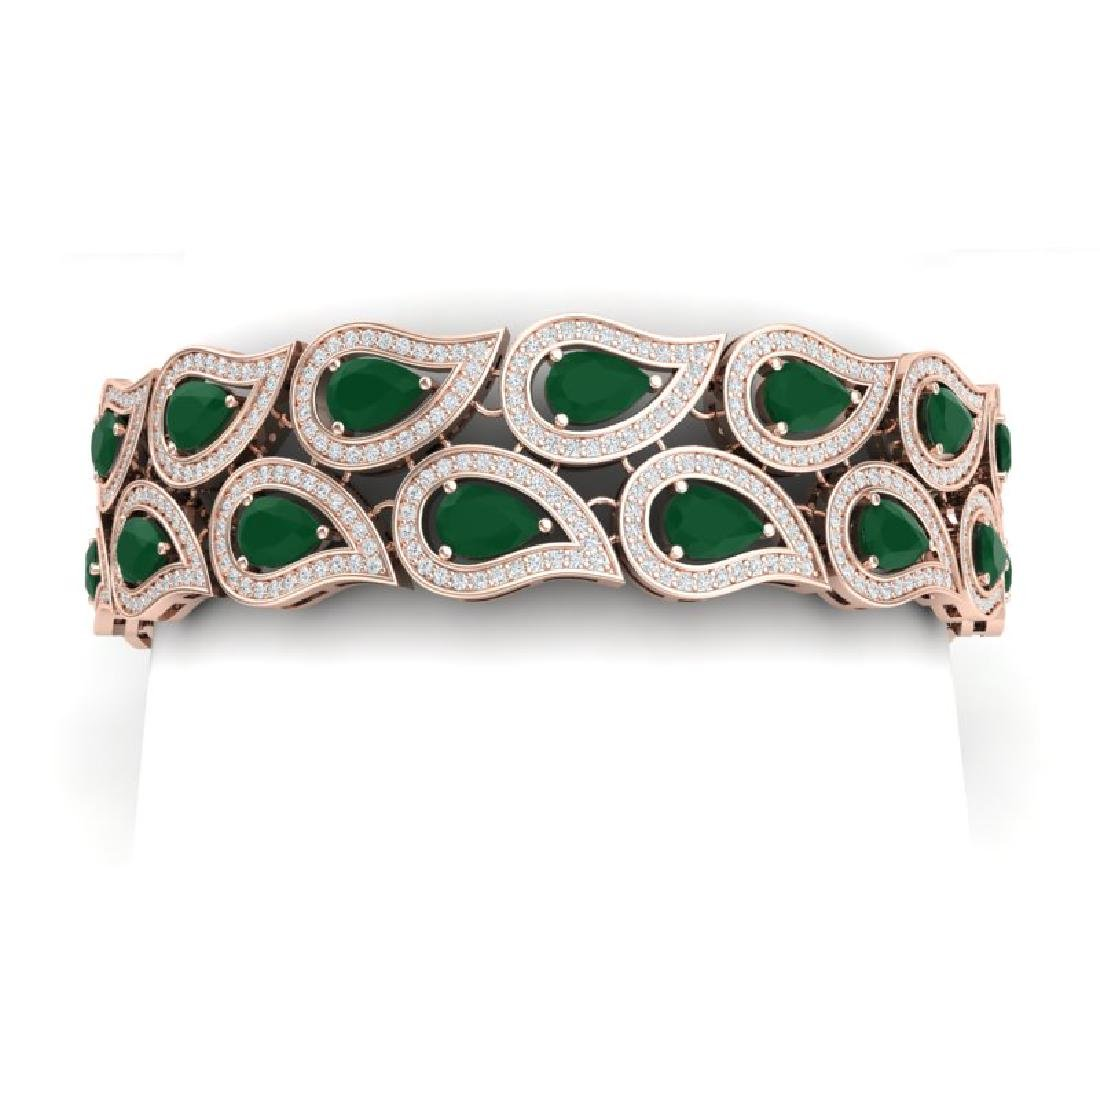 20.1 CTW Royalty Emerald & VS Diamond Bracelet 18K Rose